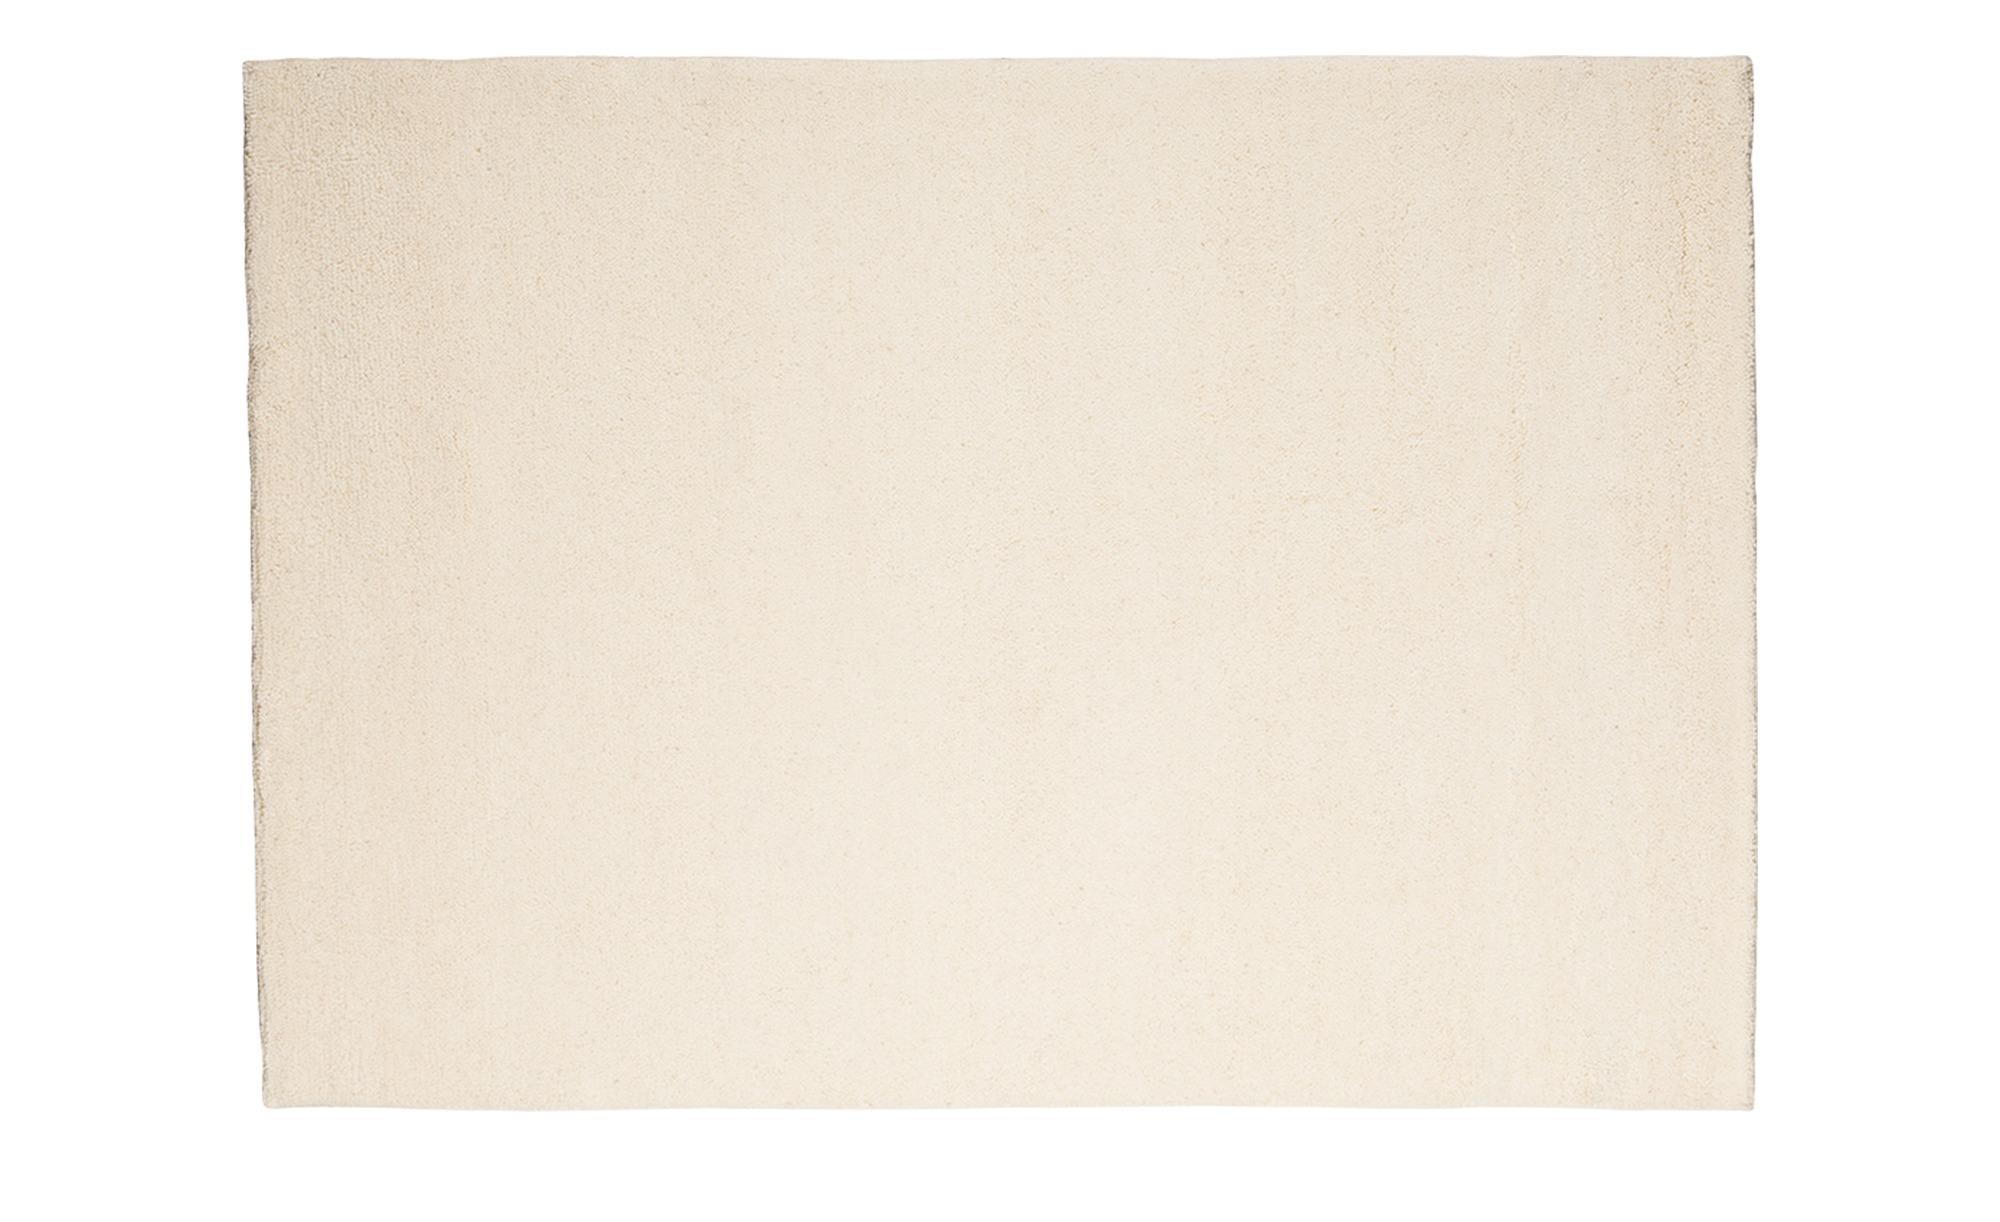 Berber teppich rabat breite 140 cm h he creme online for Schlafsofa breite 140 cm